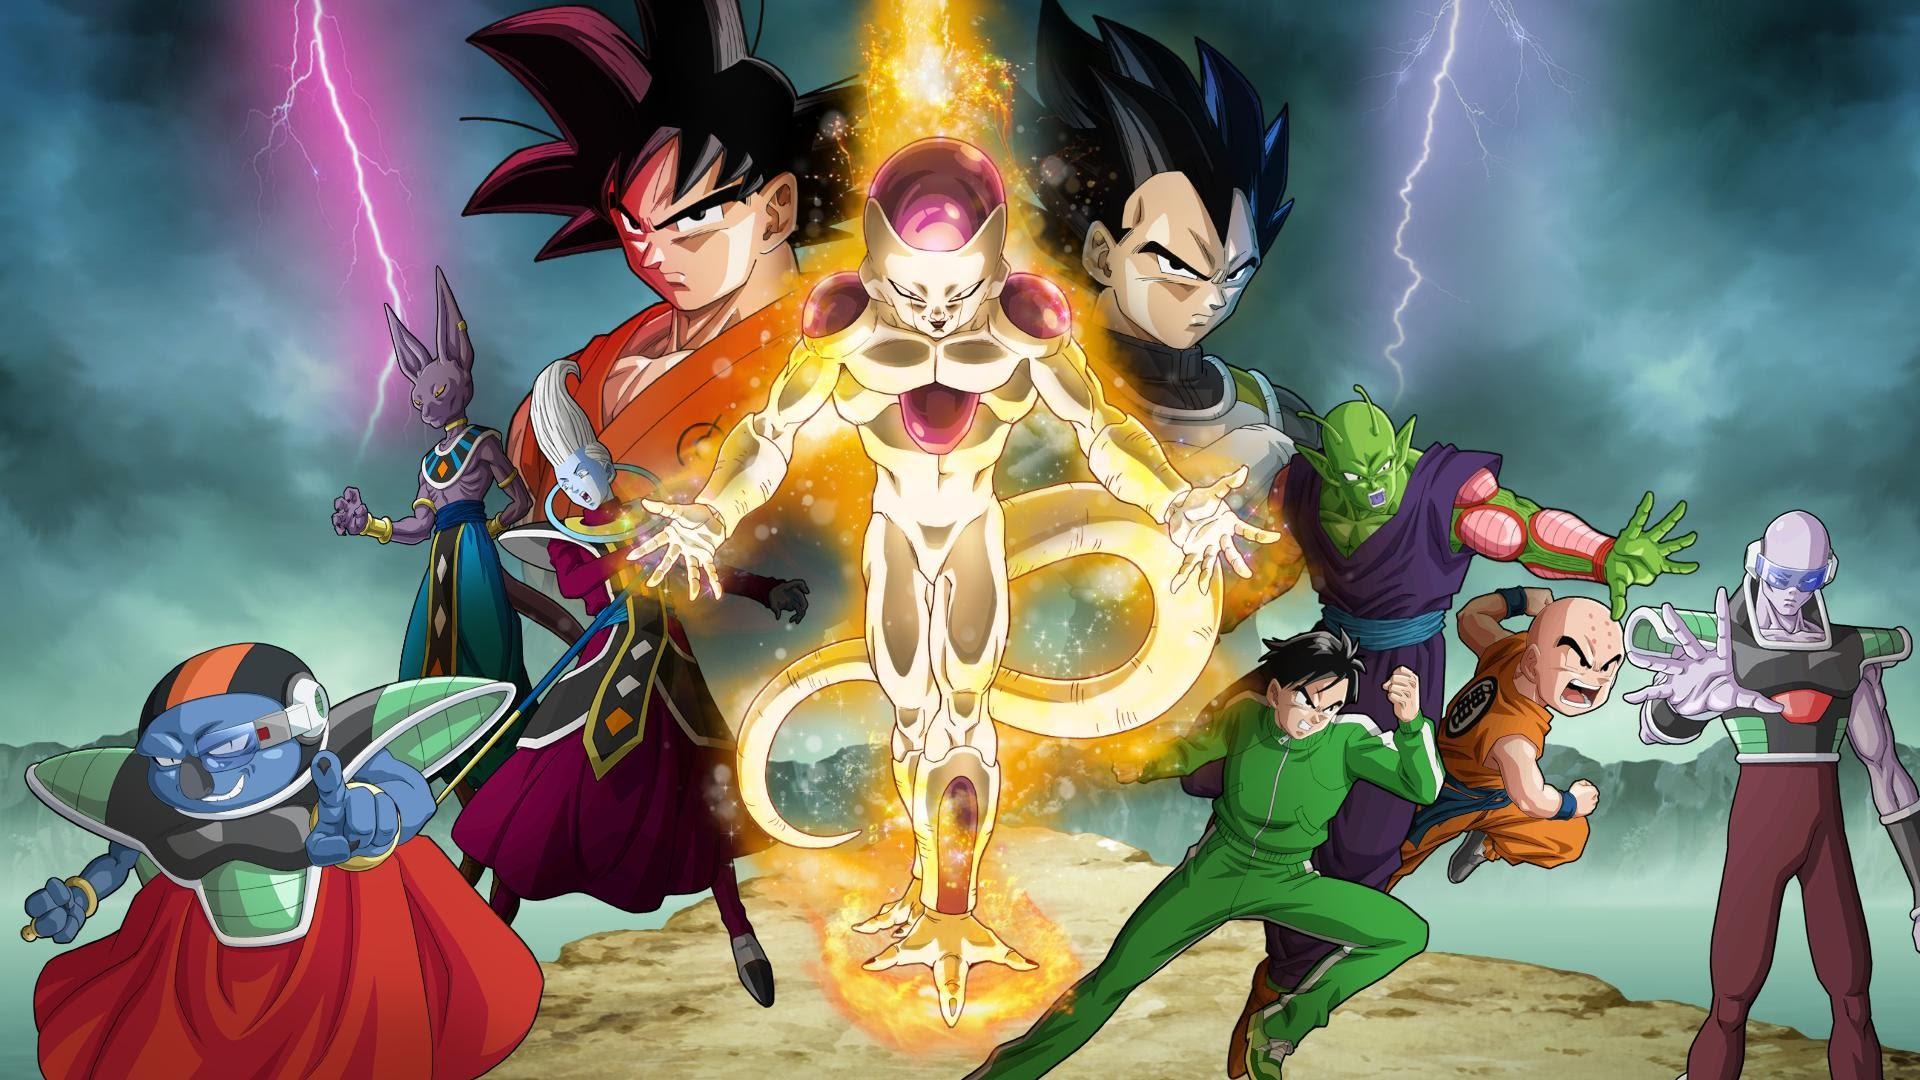 "Resultado de imagen de Dragon Ball Z: Resurrection 'F' wallpaper"""